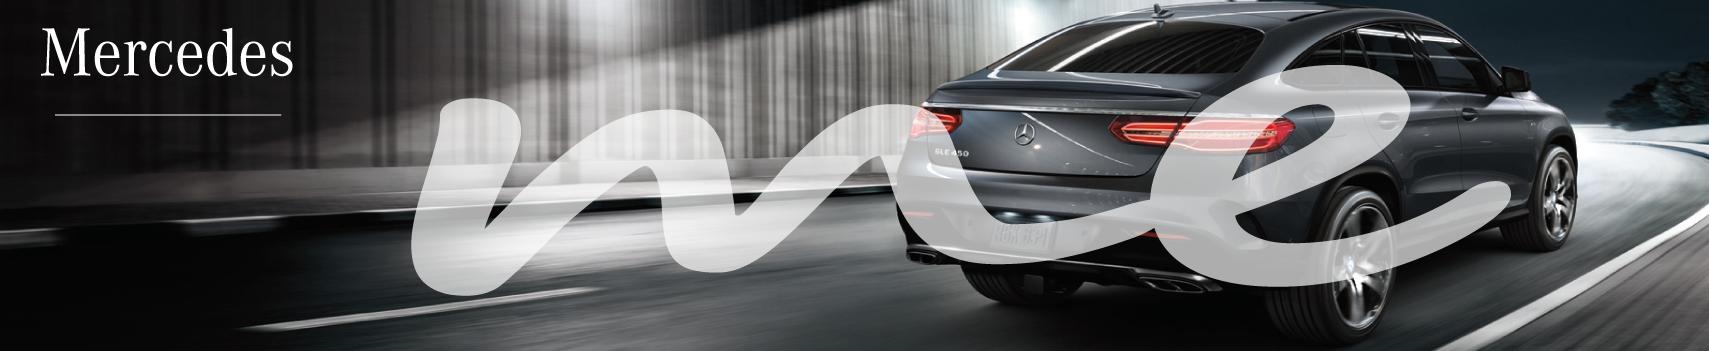 Mercedes-me-top-banner_2